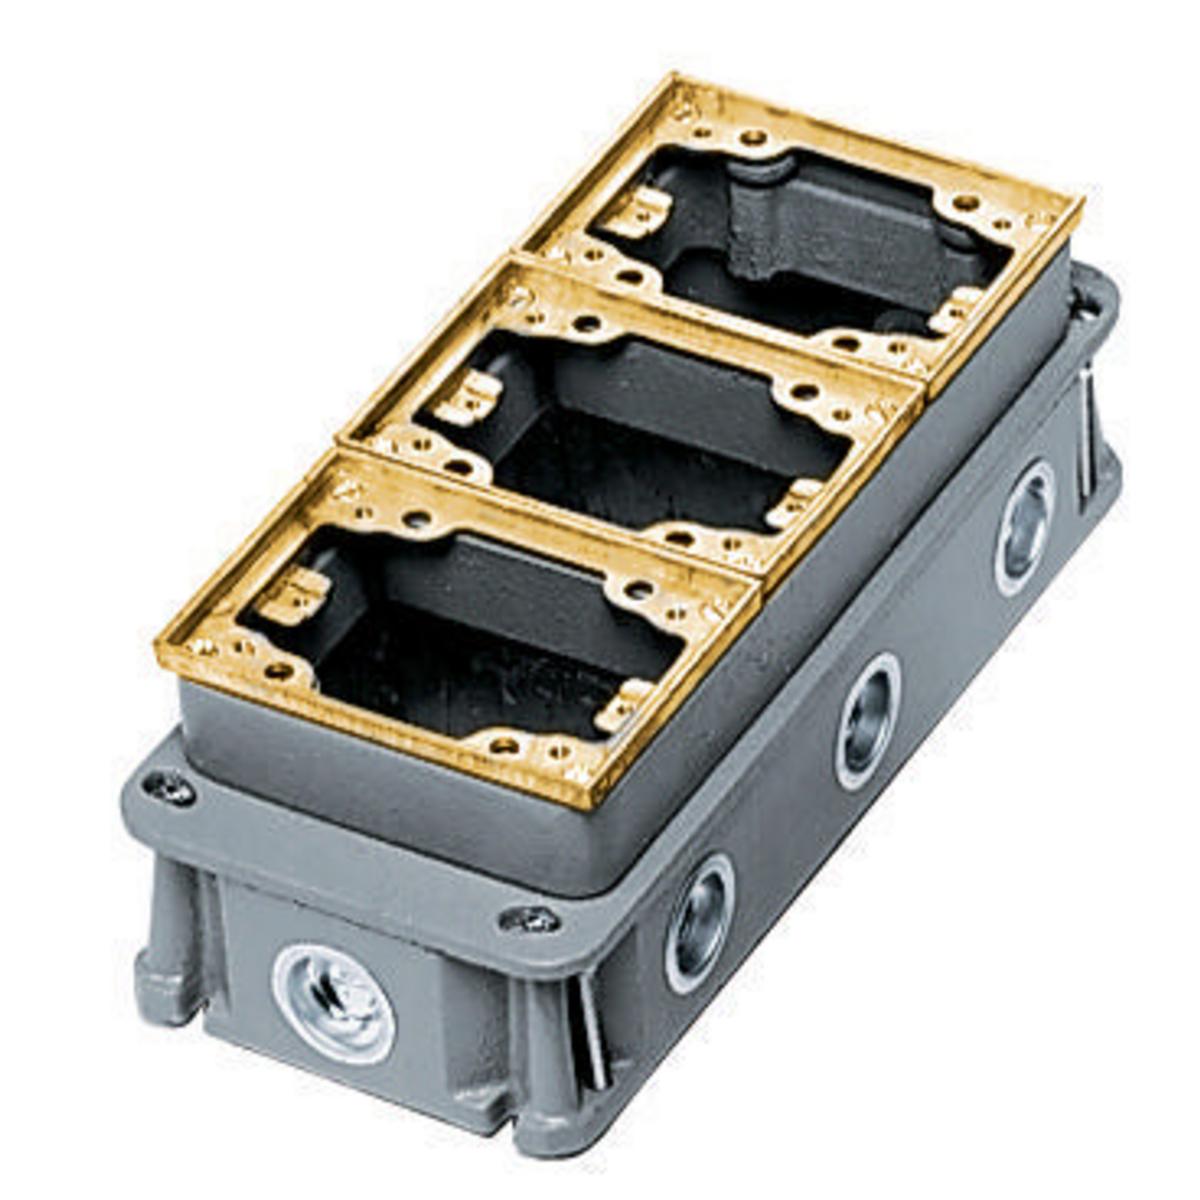 hubbell b4333 3g floor box adjustable